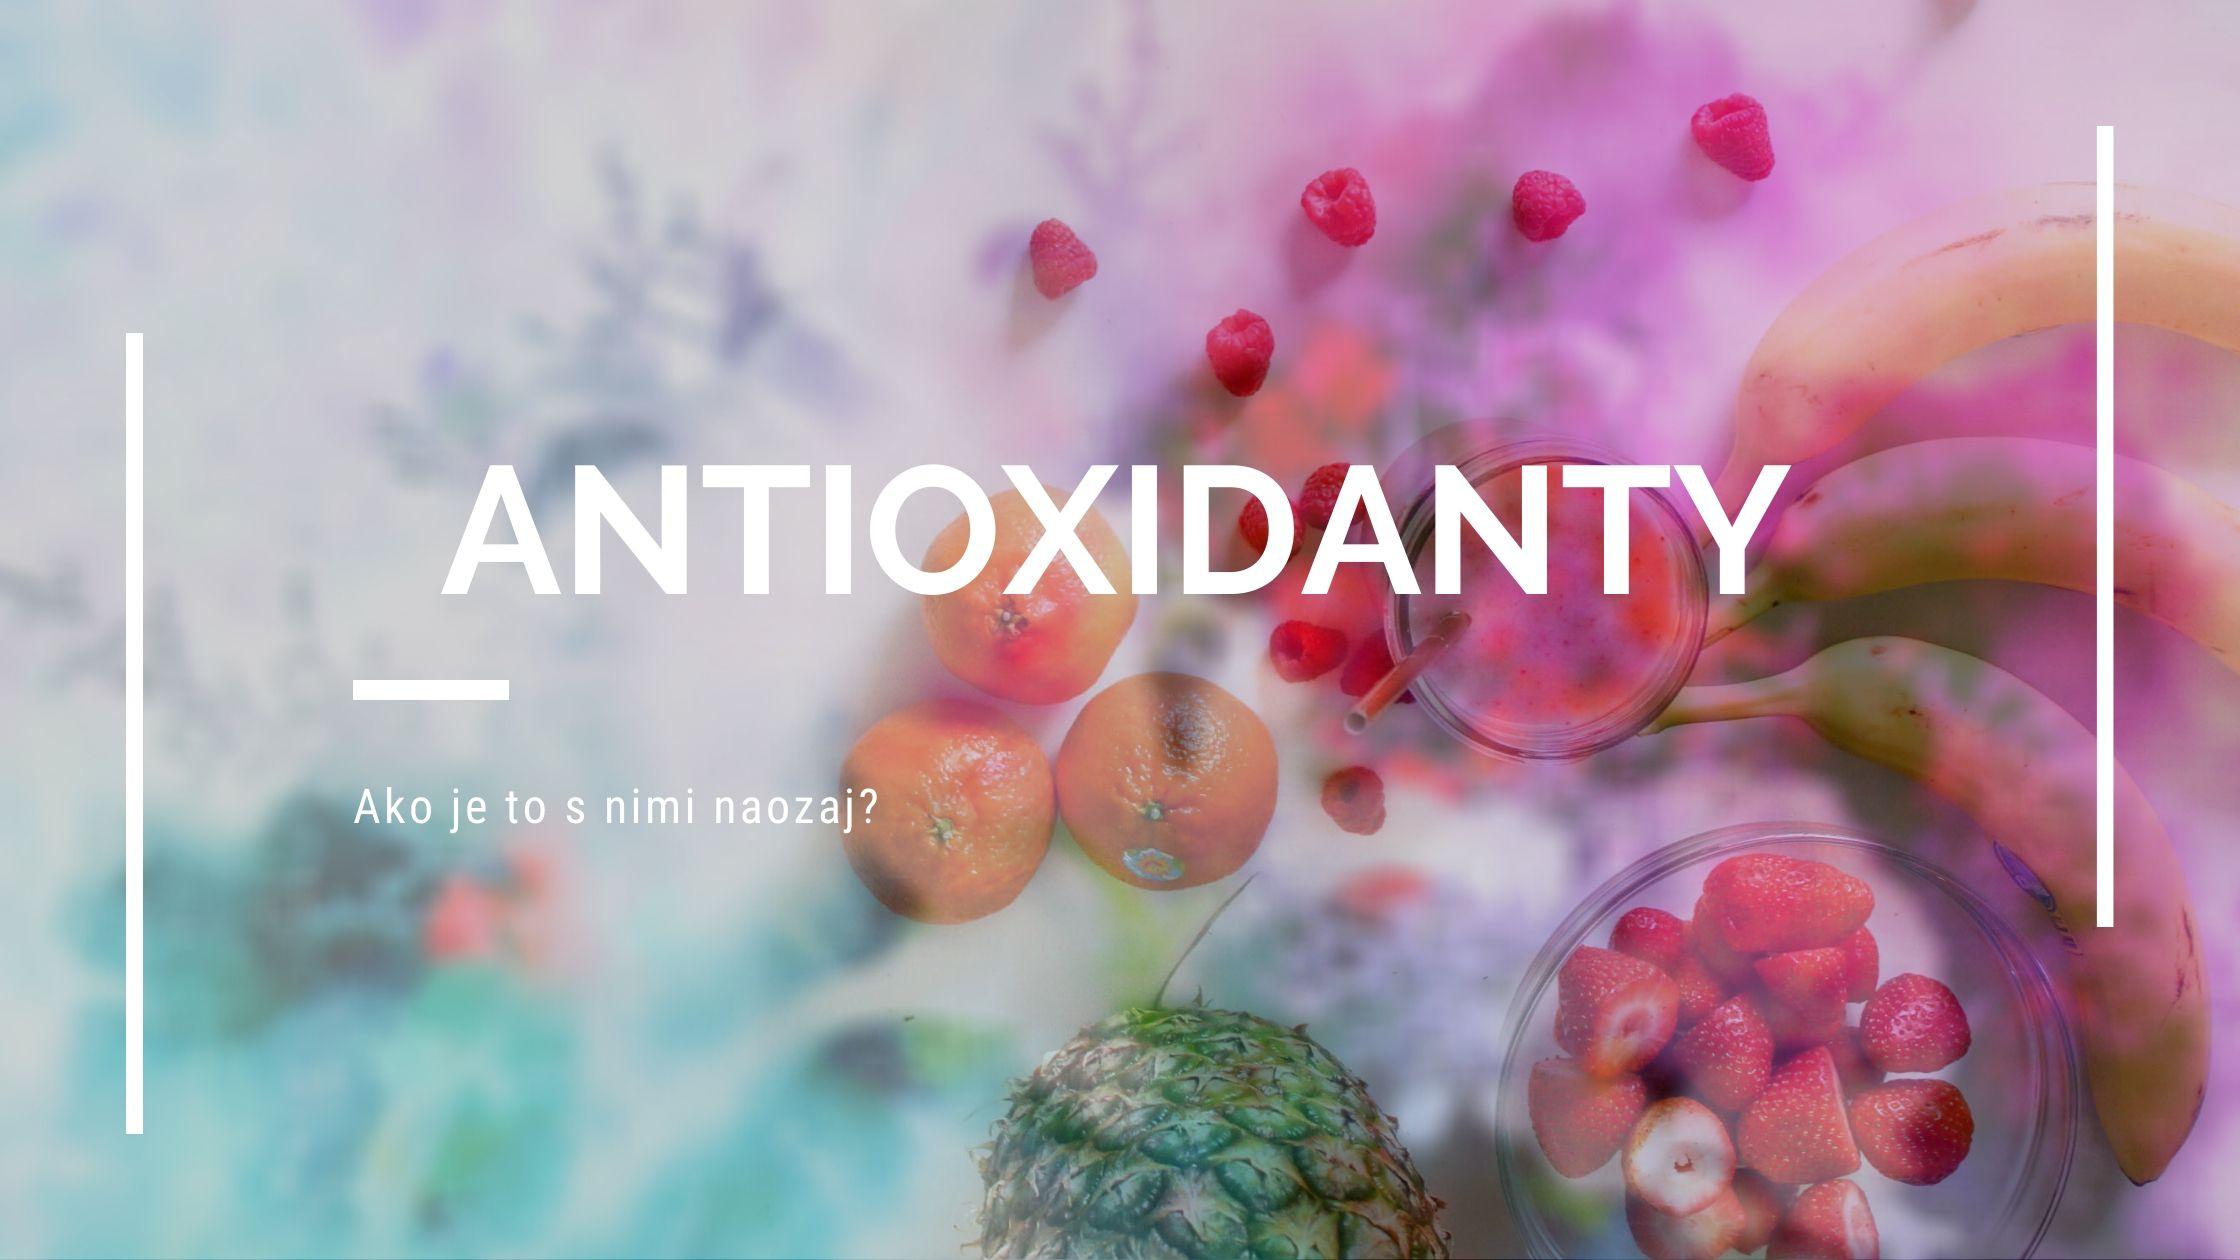 Antioxidanty, medicinalnehuby.sk, Reishi, Cordyceps